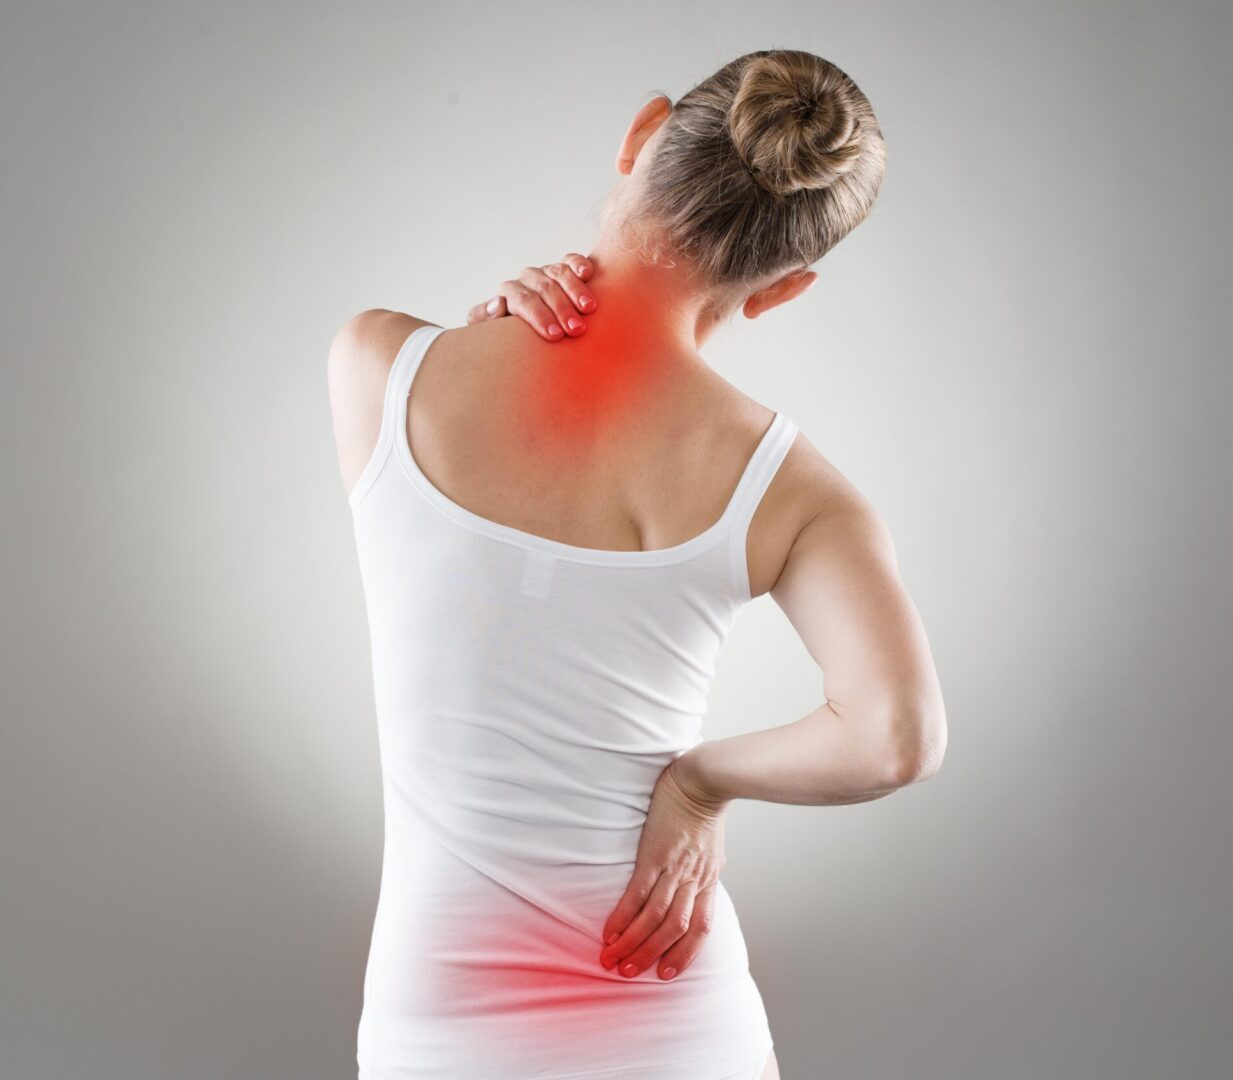 Auto injury massage